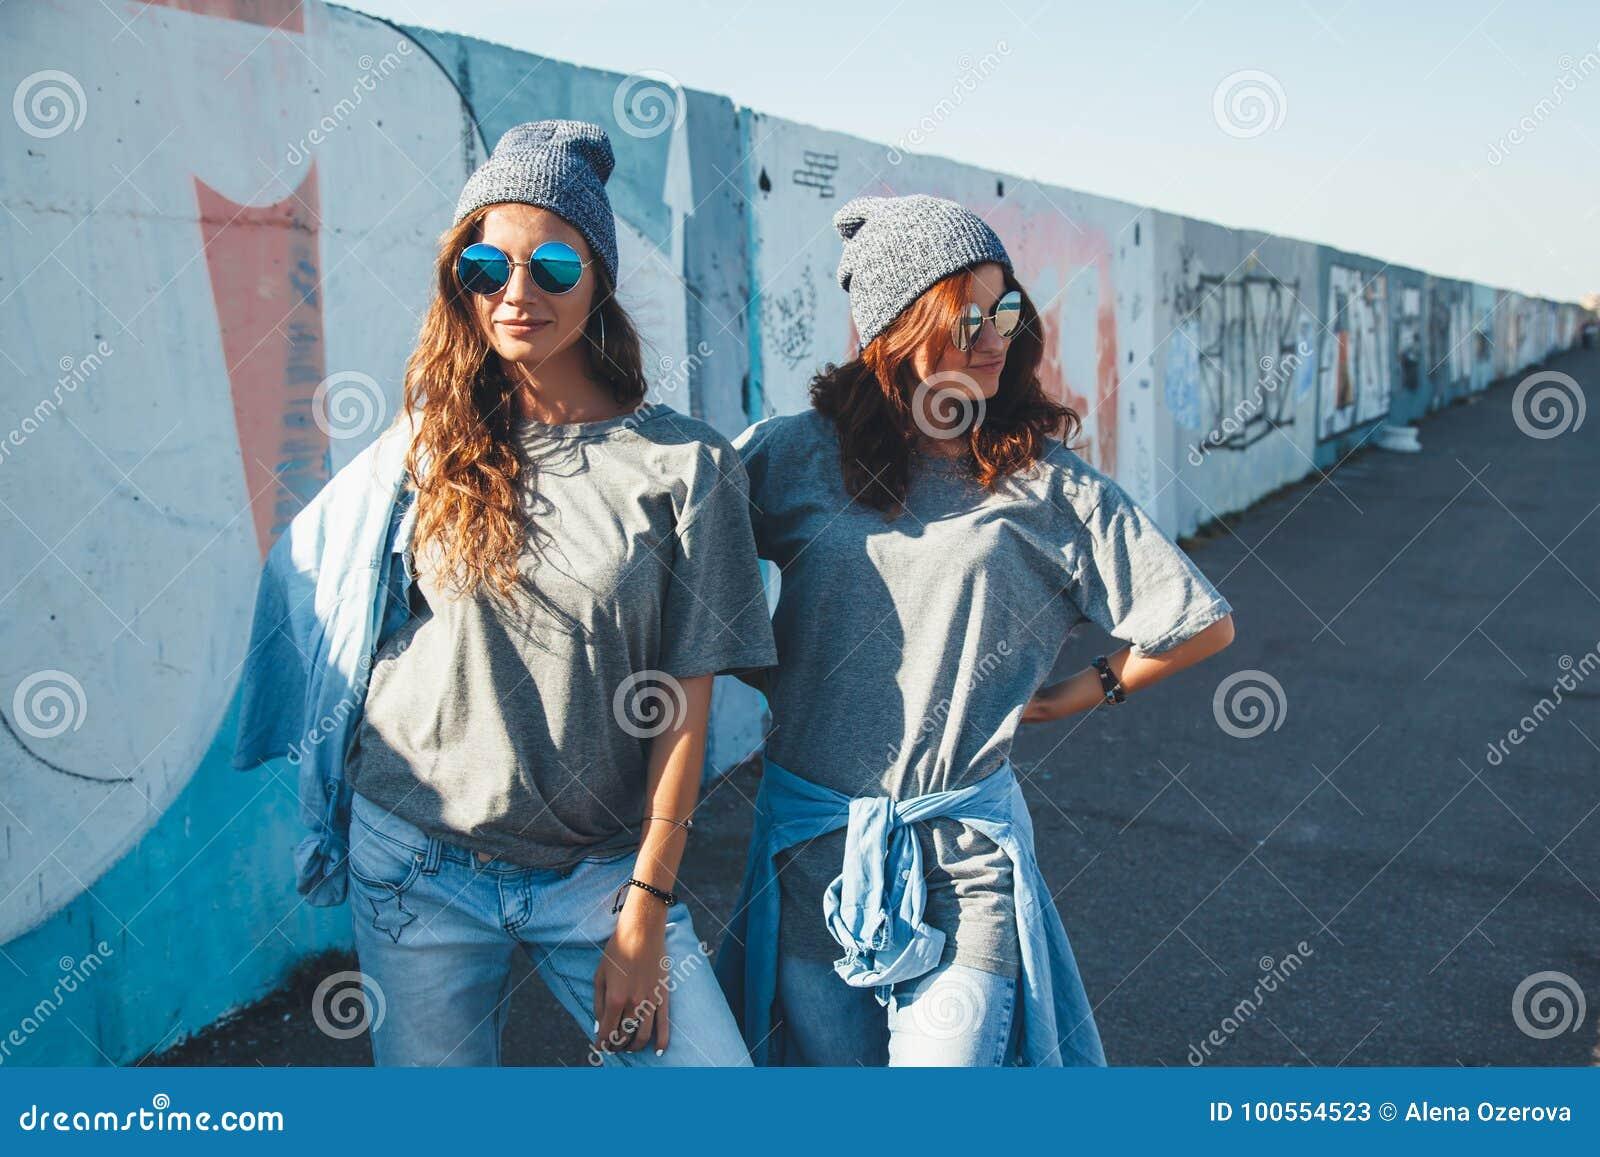 Models Wearing Plain Tshirt And Sunglasses Posing Over